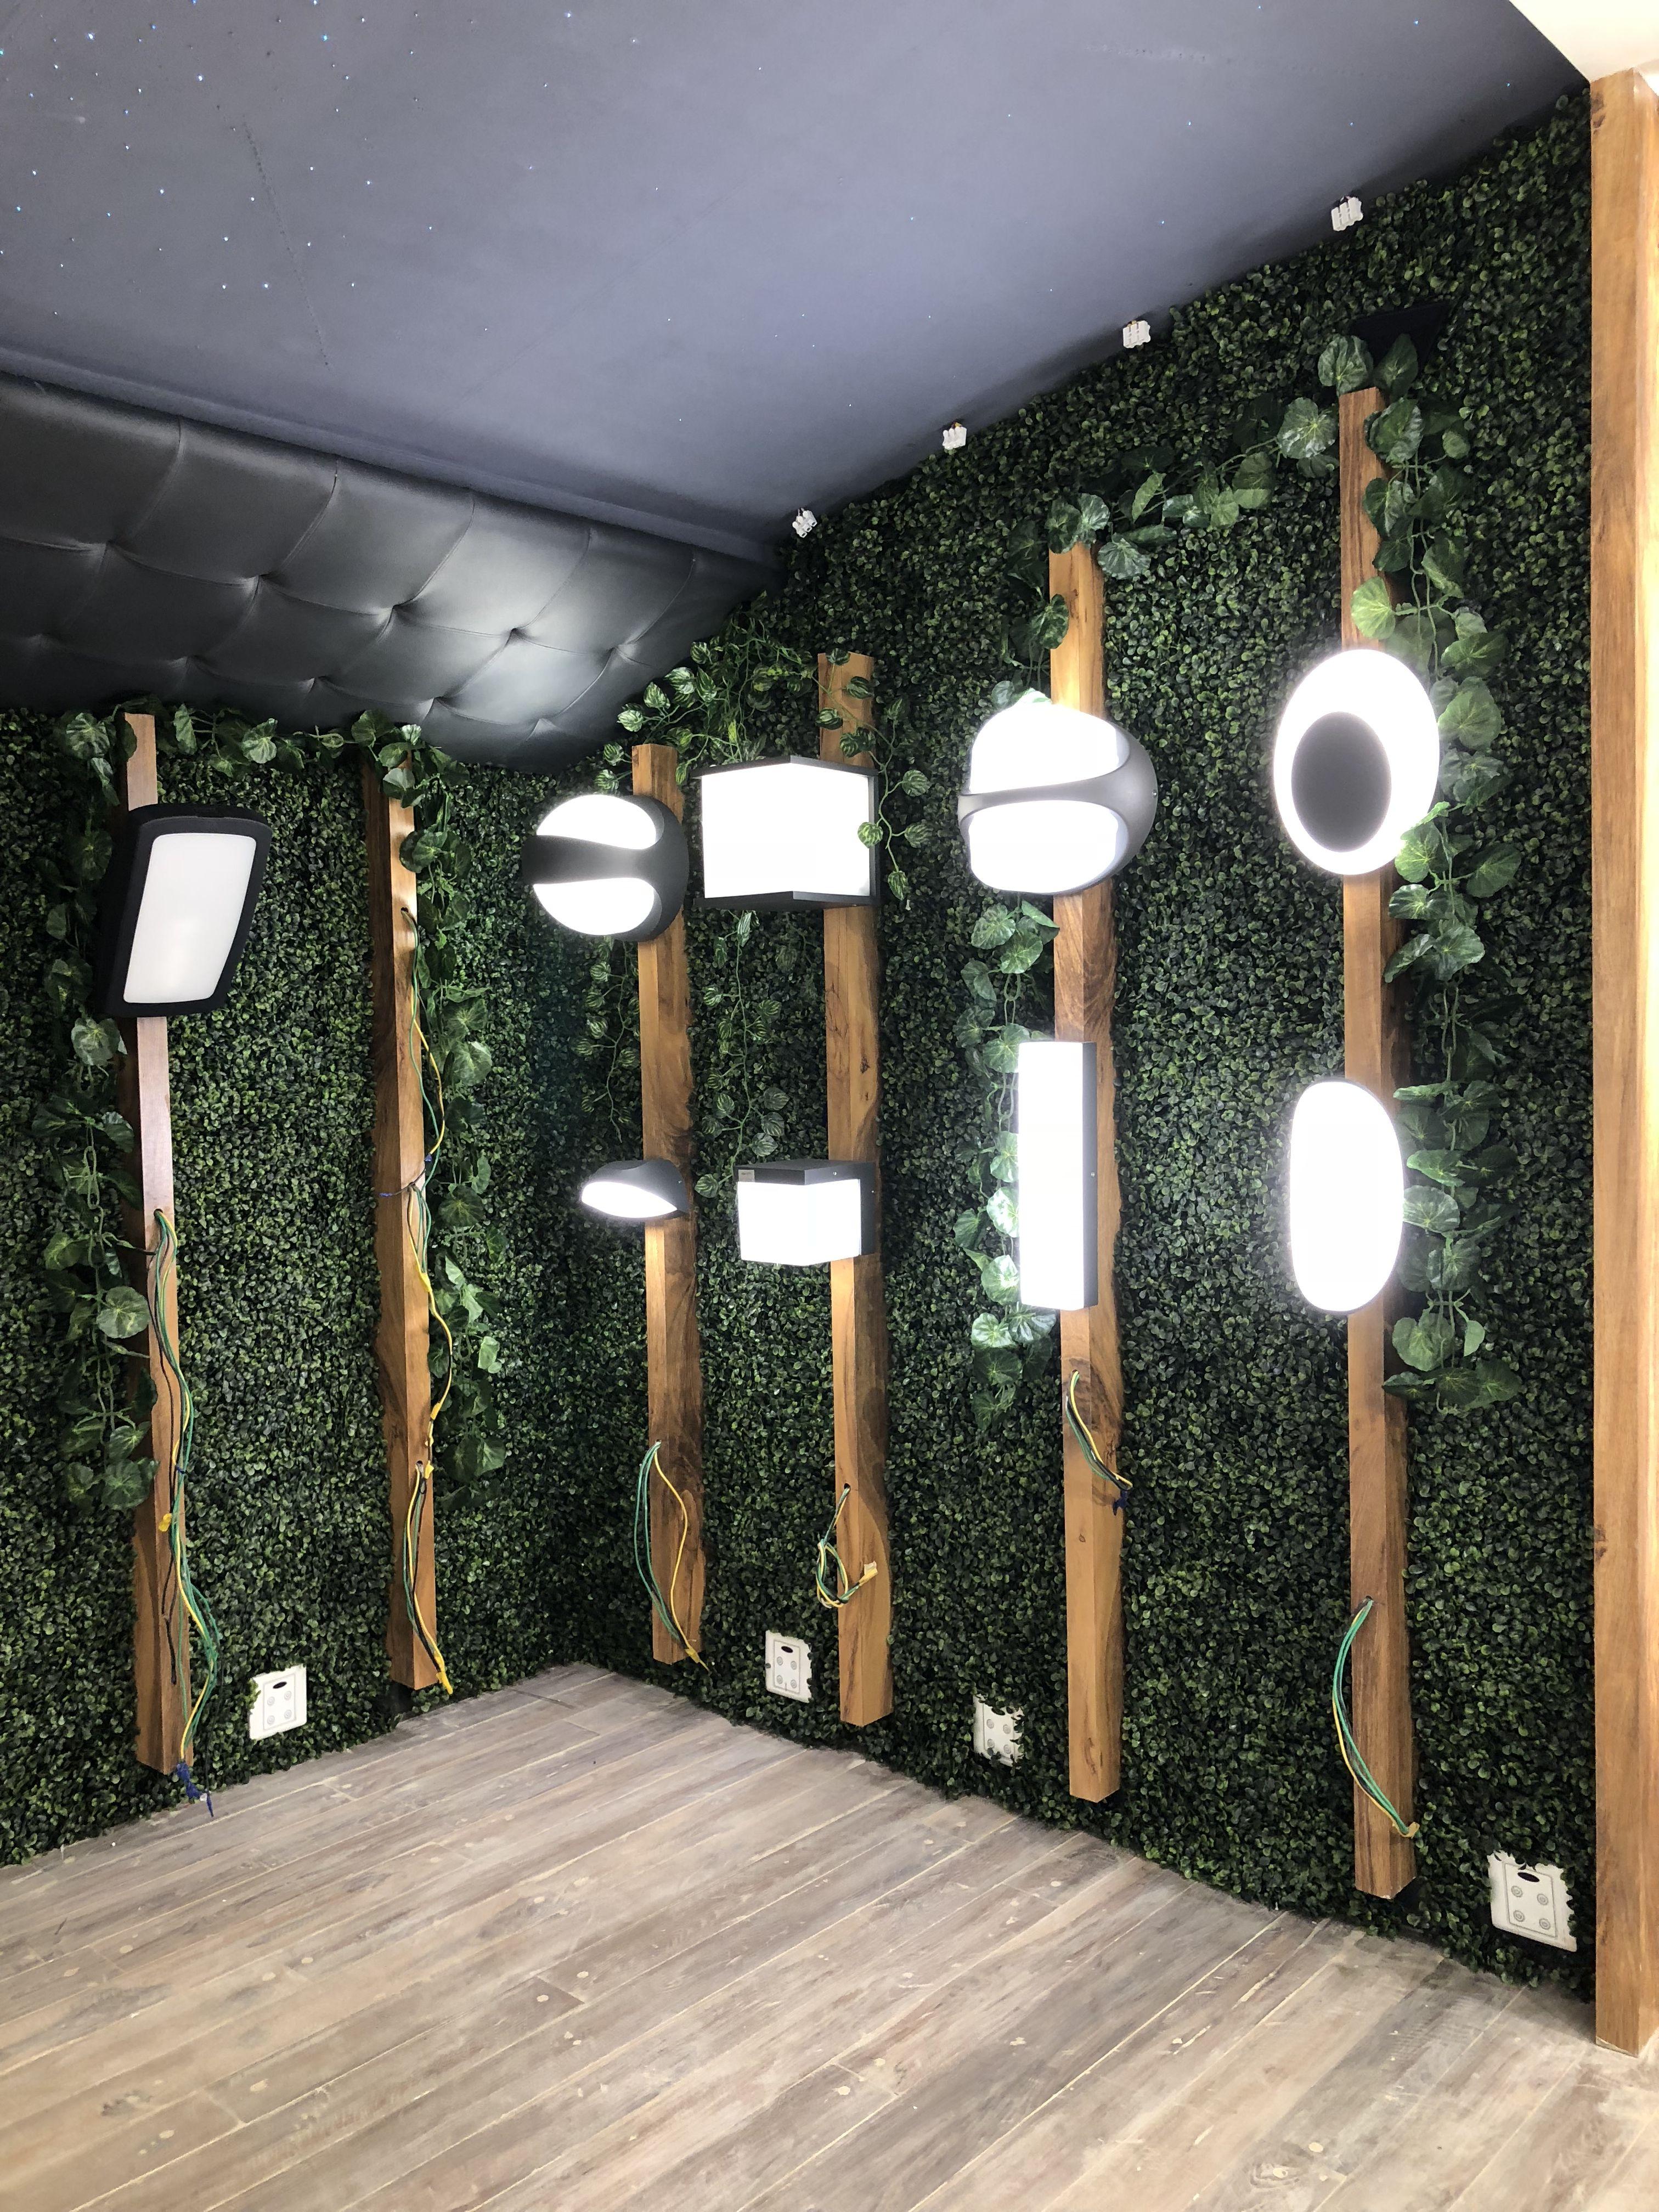 Outdoorlights Greenwall Light Display Showroom Light